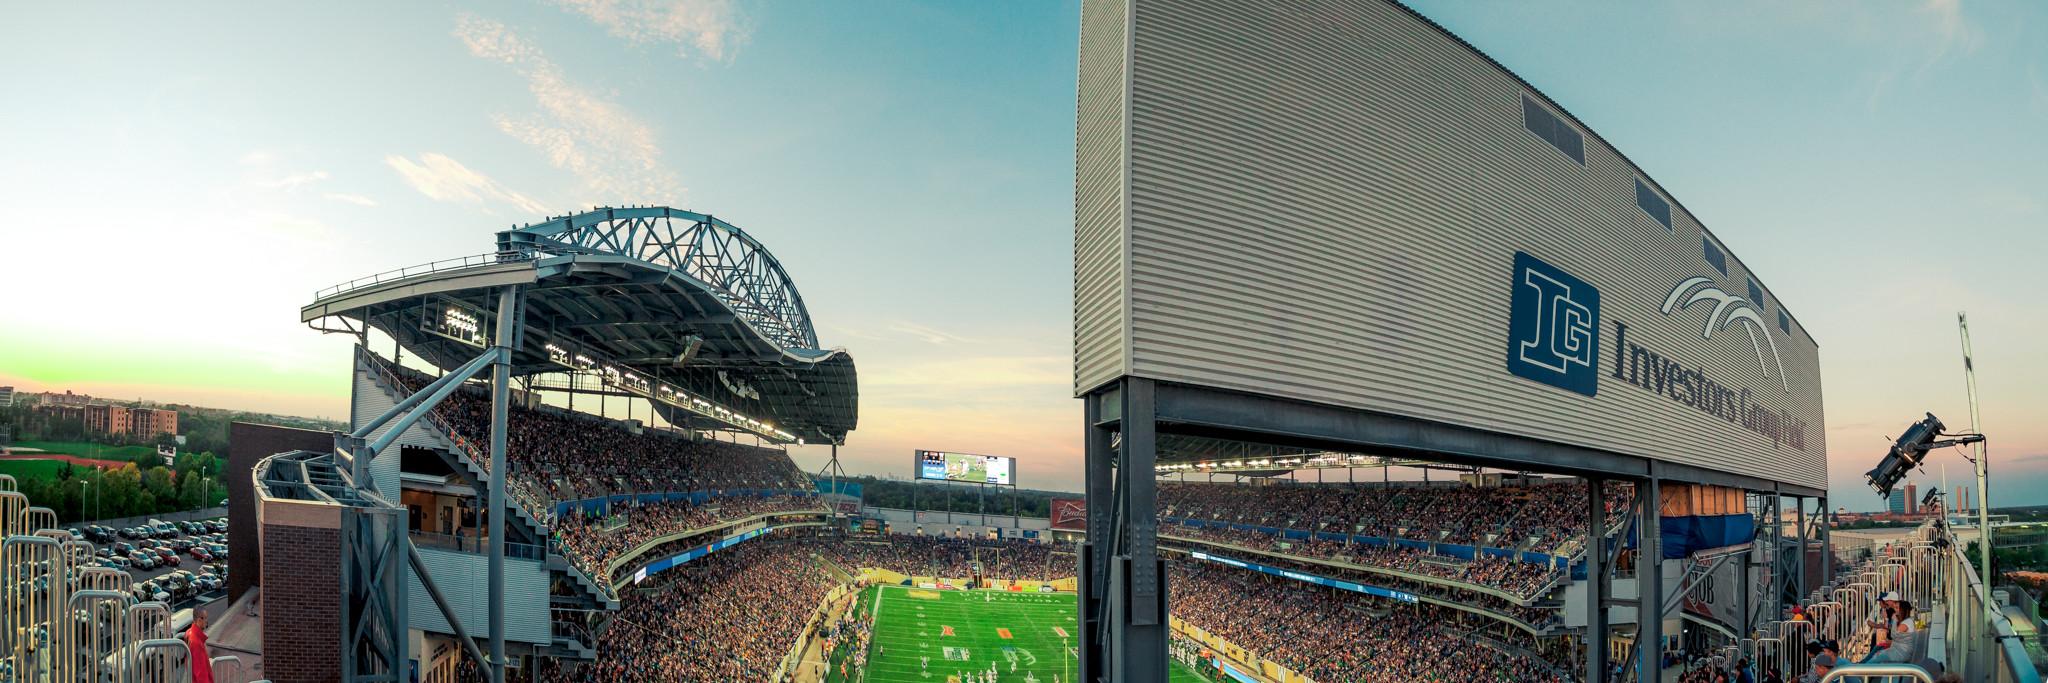 Stadium Information - Winnipeg Blue Bombers